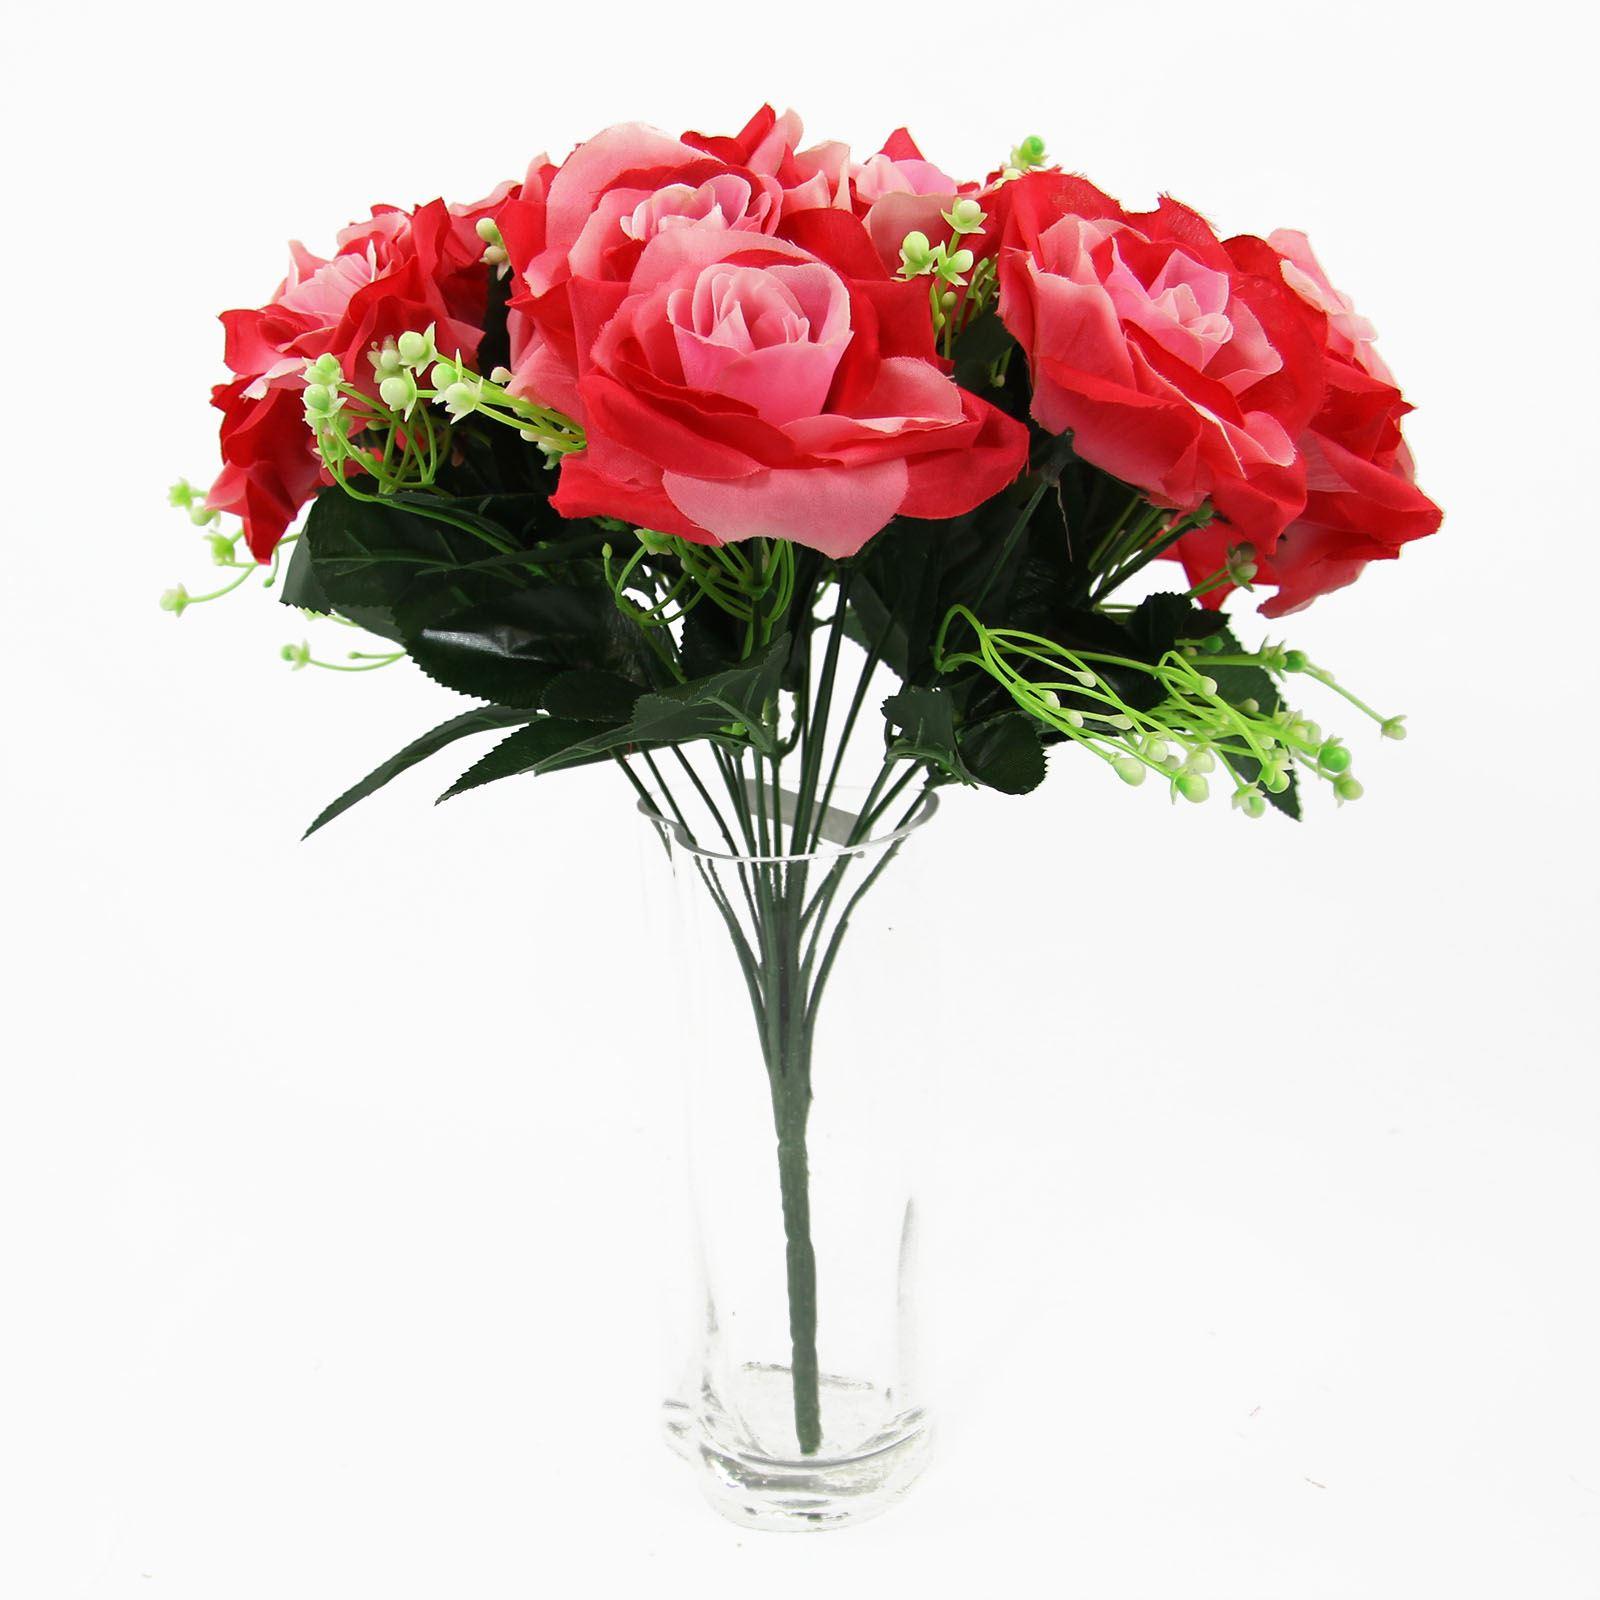 Silk Flower Bouquets Do Yourself: XL 18 Head Open Rose Bouquet! Large Premium Fake Silk